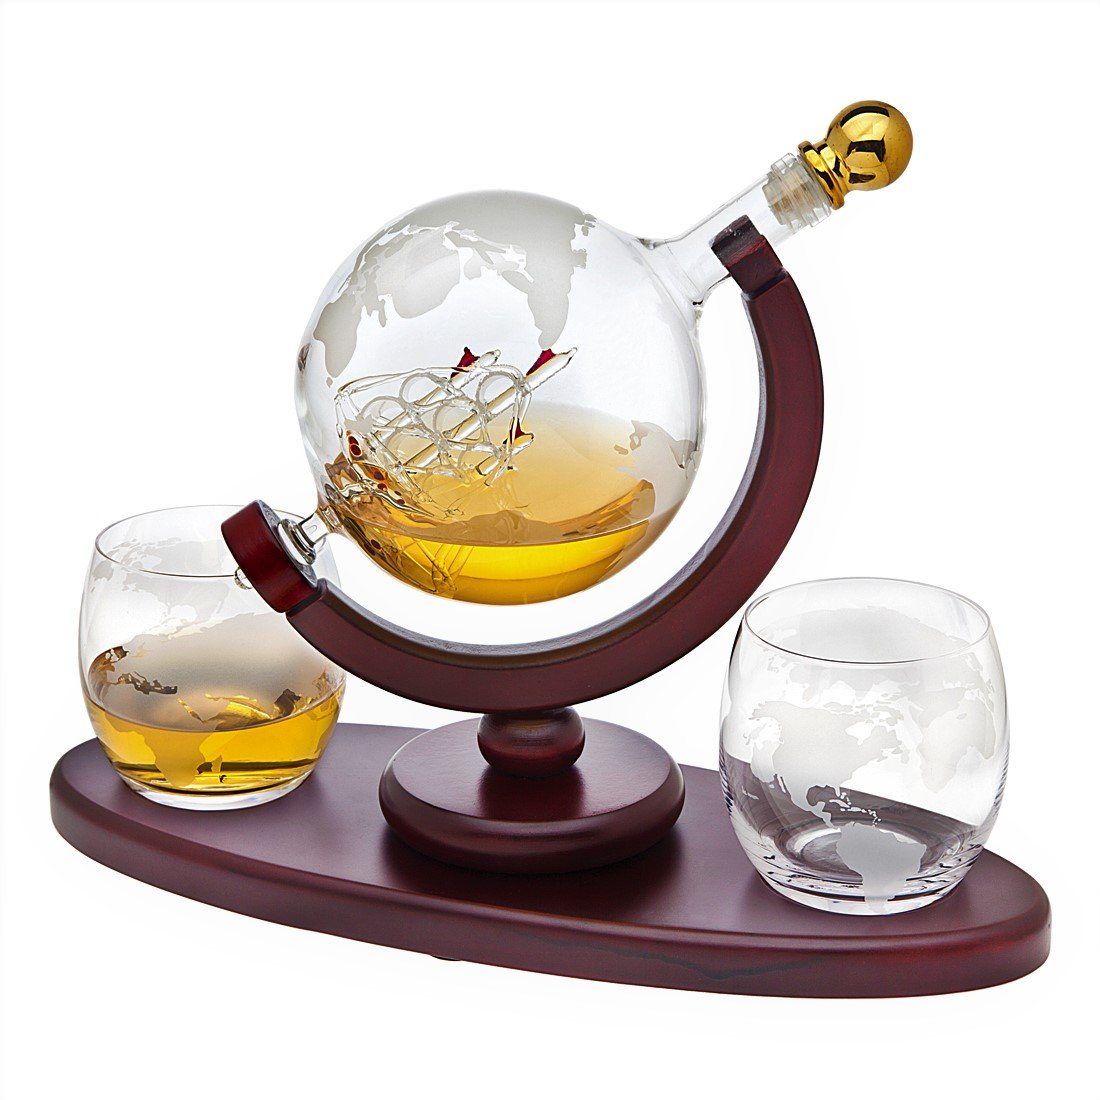 Whiskey Decanter Globe Set with 2 Etched Globe Whisky Glasses - for Liquor, Scotch, Bourbon, Vodka - 850ml by Godinger